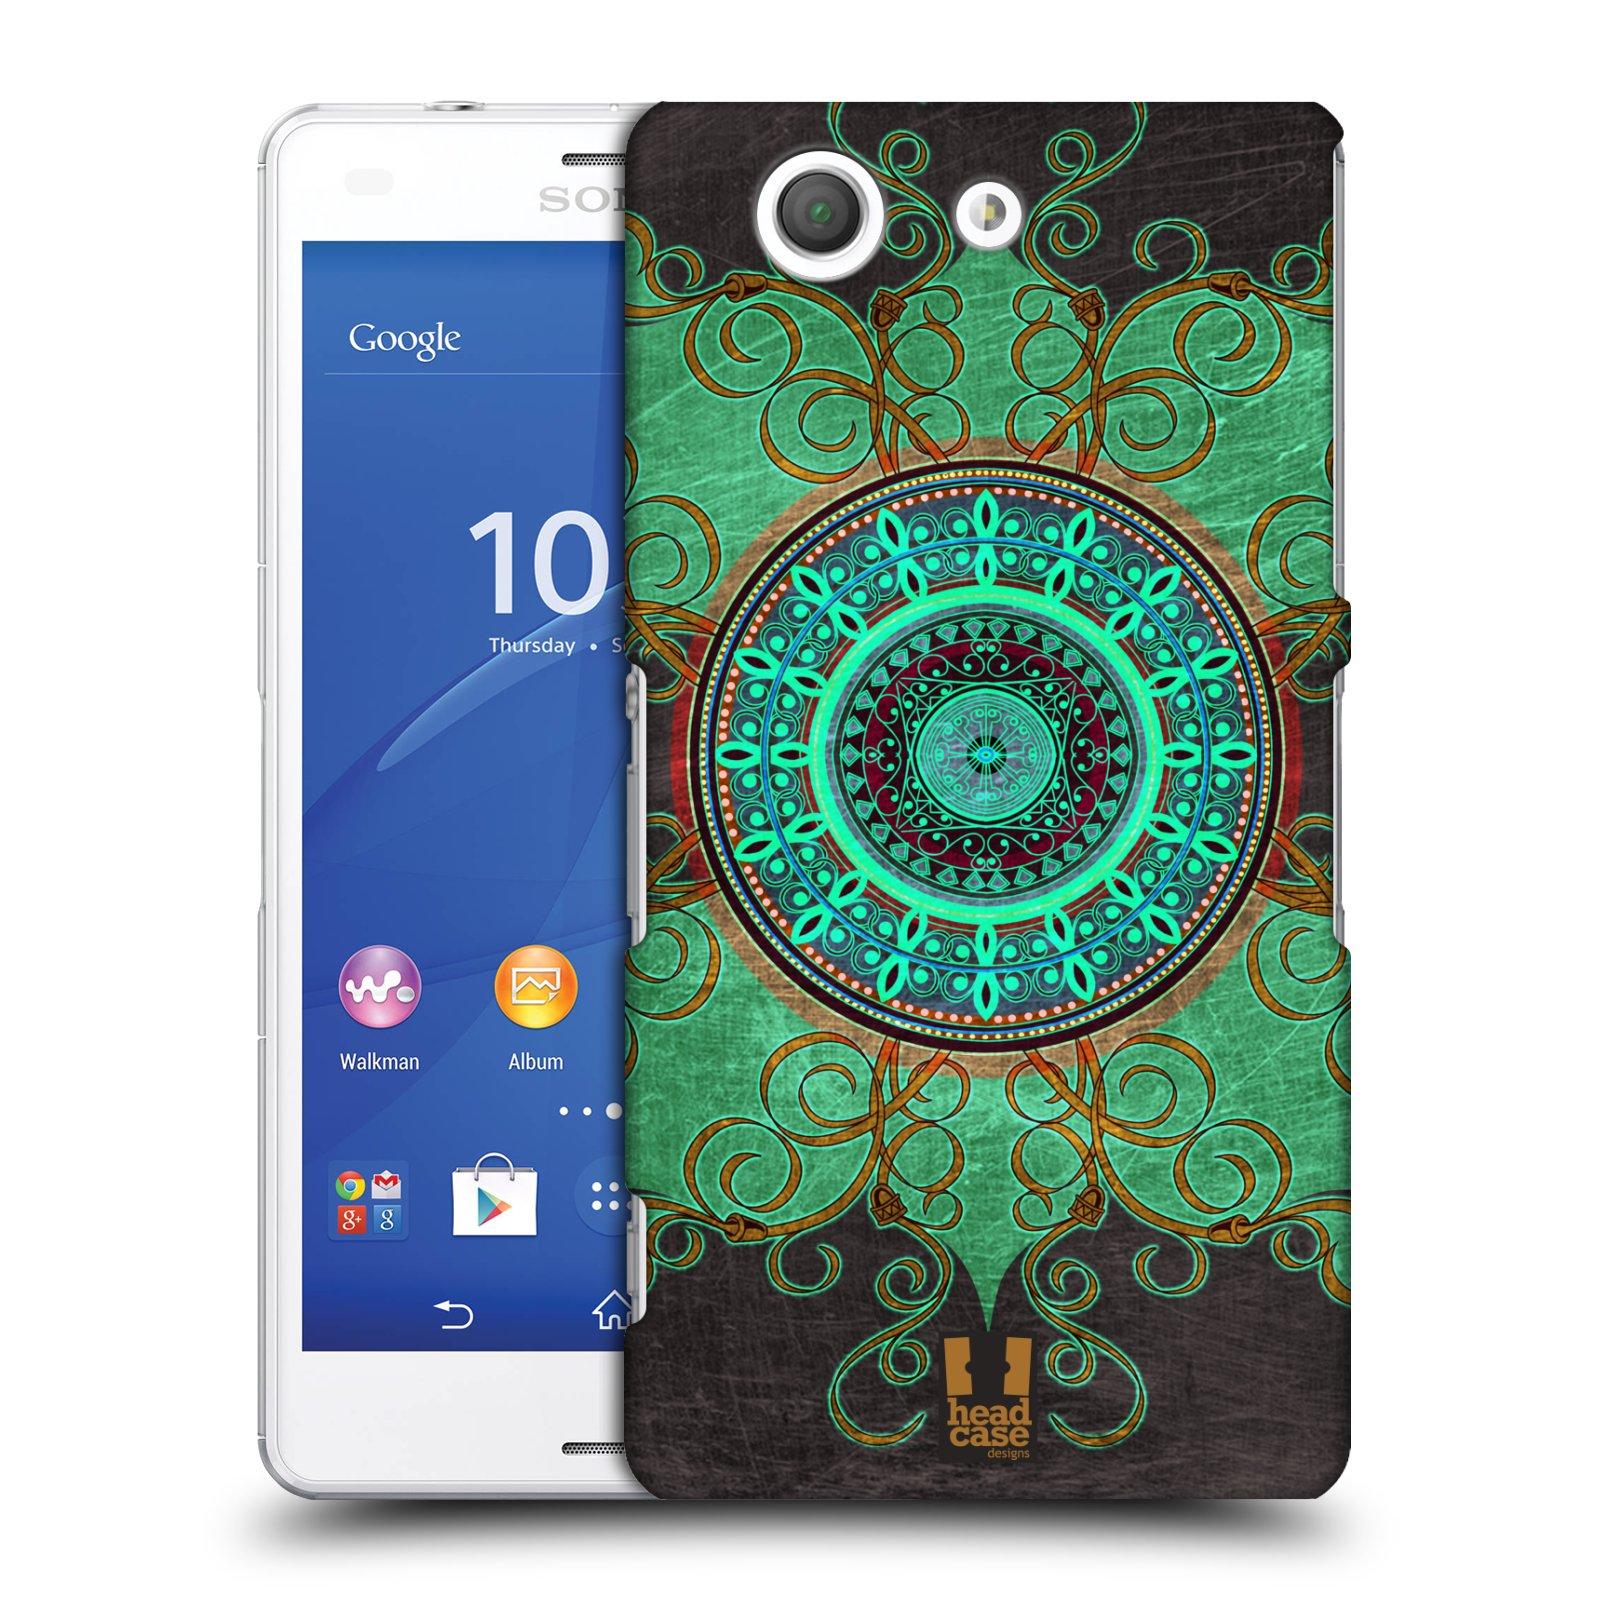 Plastové pouzdro na mobil Sony Xperia Z3 Compact D5803 HEAD CASE ARAB MANDALA